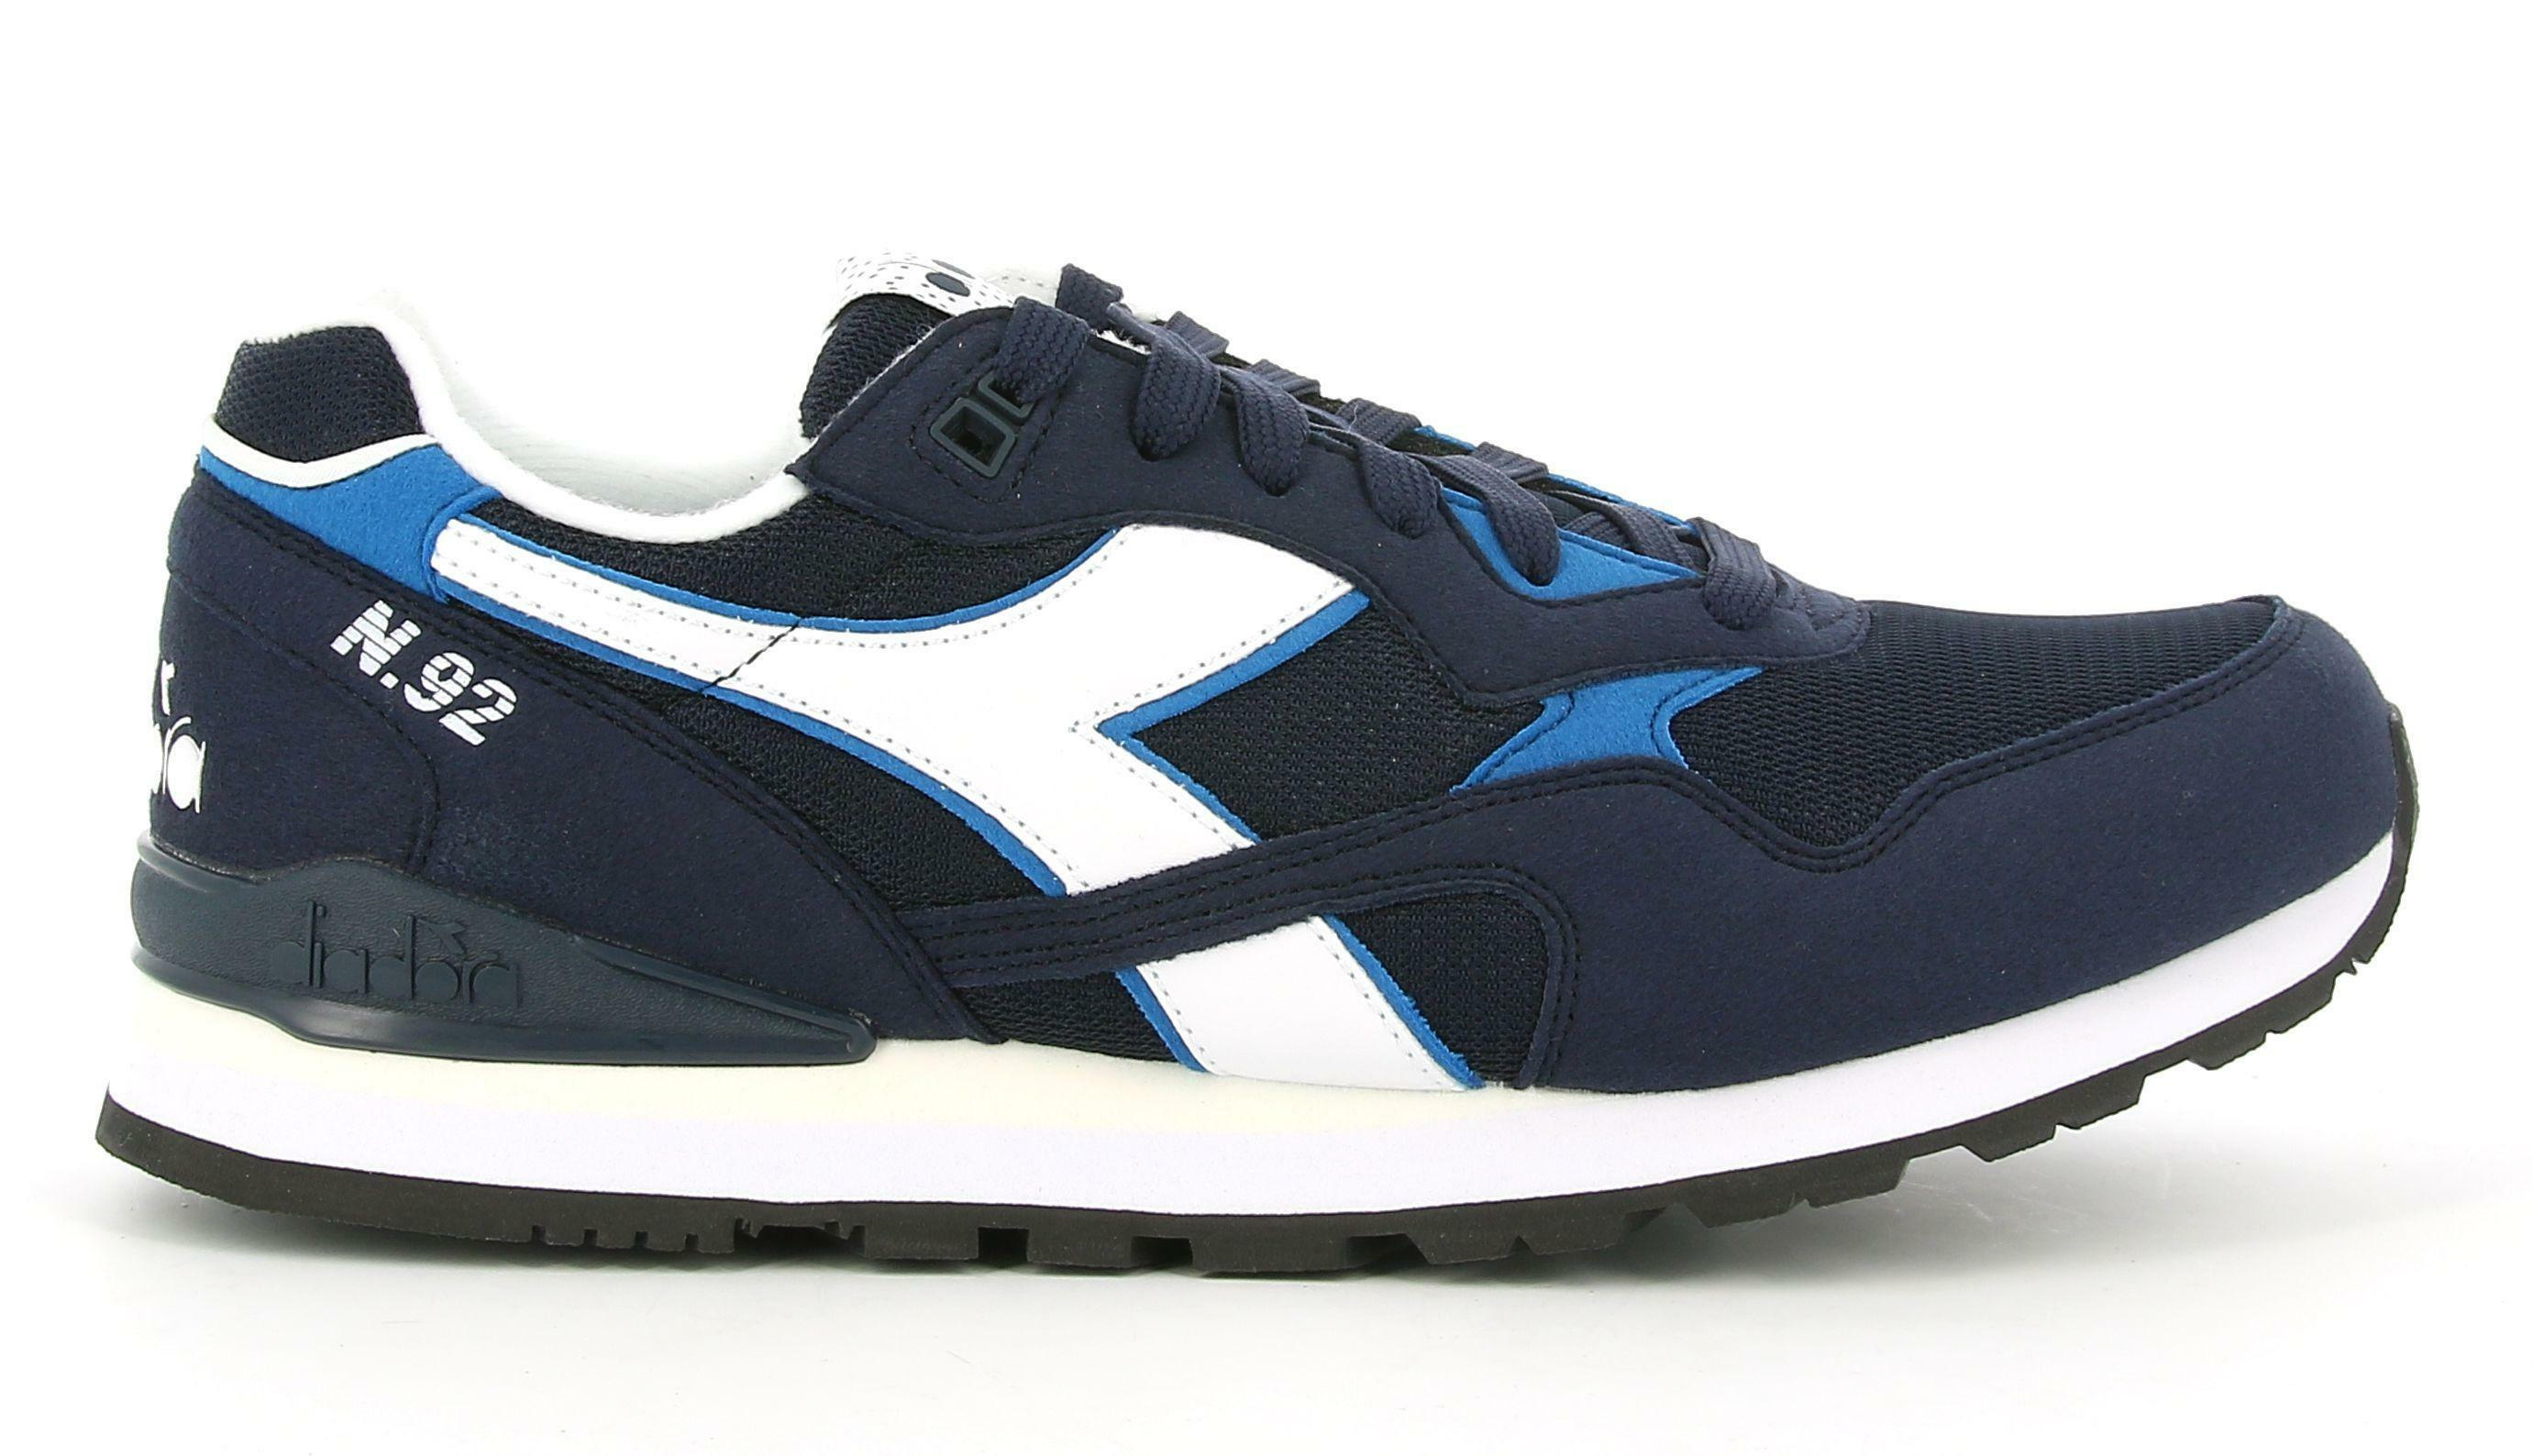 diadora diadora n.92 173169 scarpa sportiva da uomo blu